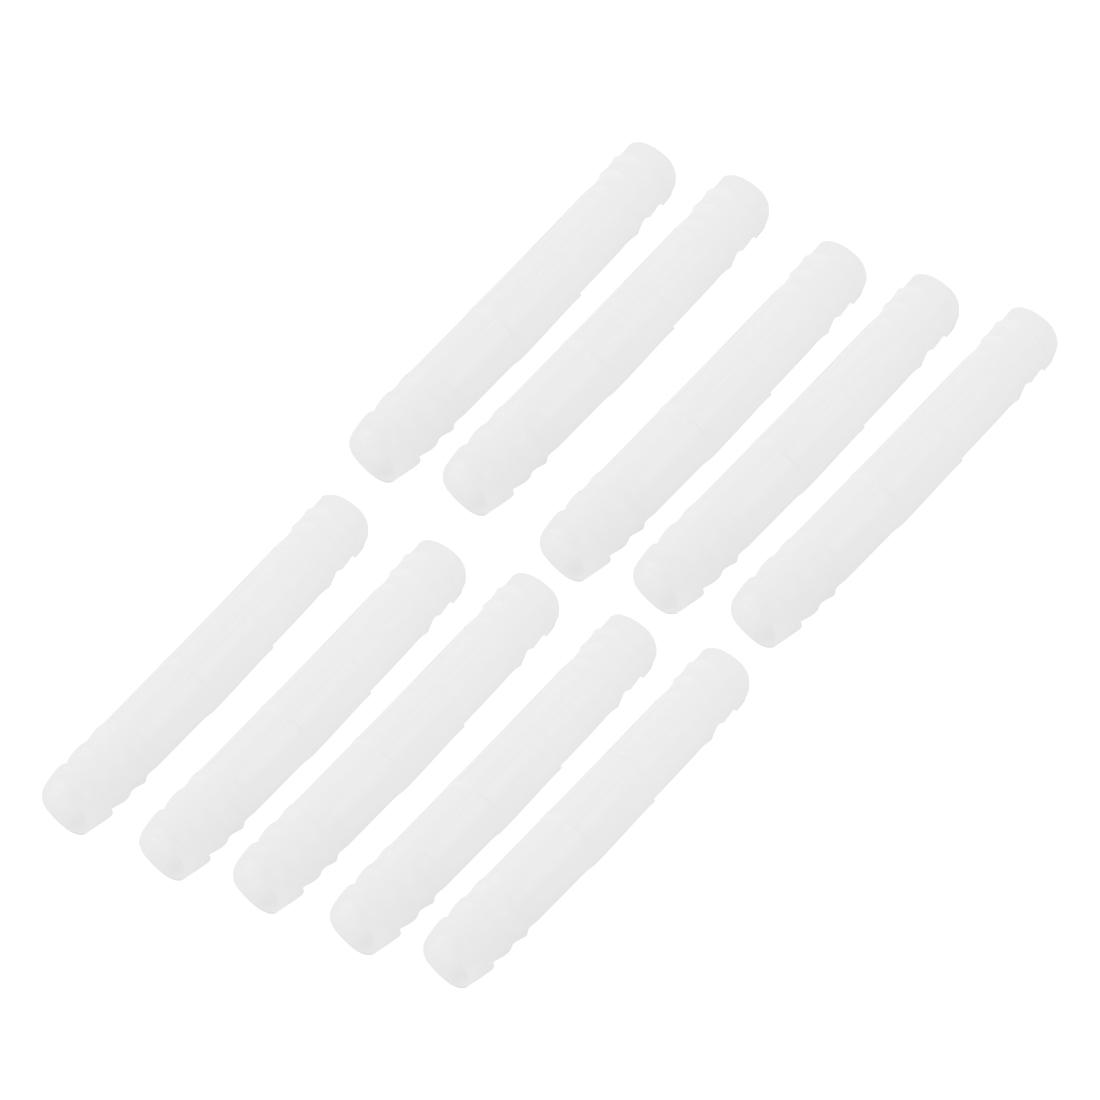 Aquarium Tank Plastic Hose Barb Straight Connector 9mm Dia Air Line Tubing 10 Pcs